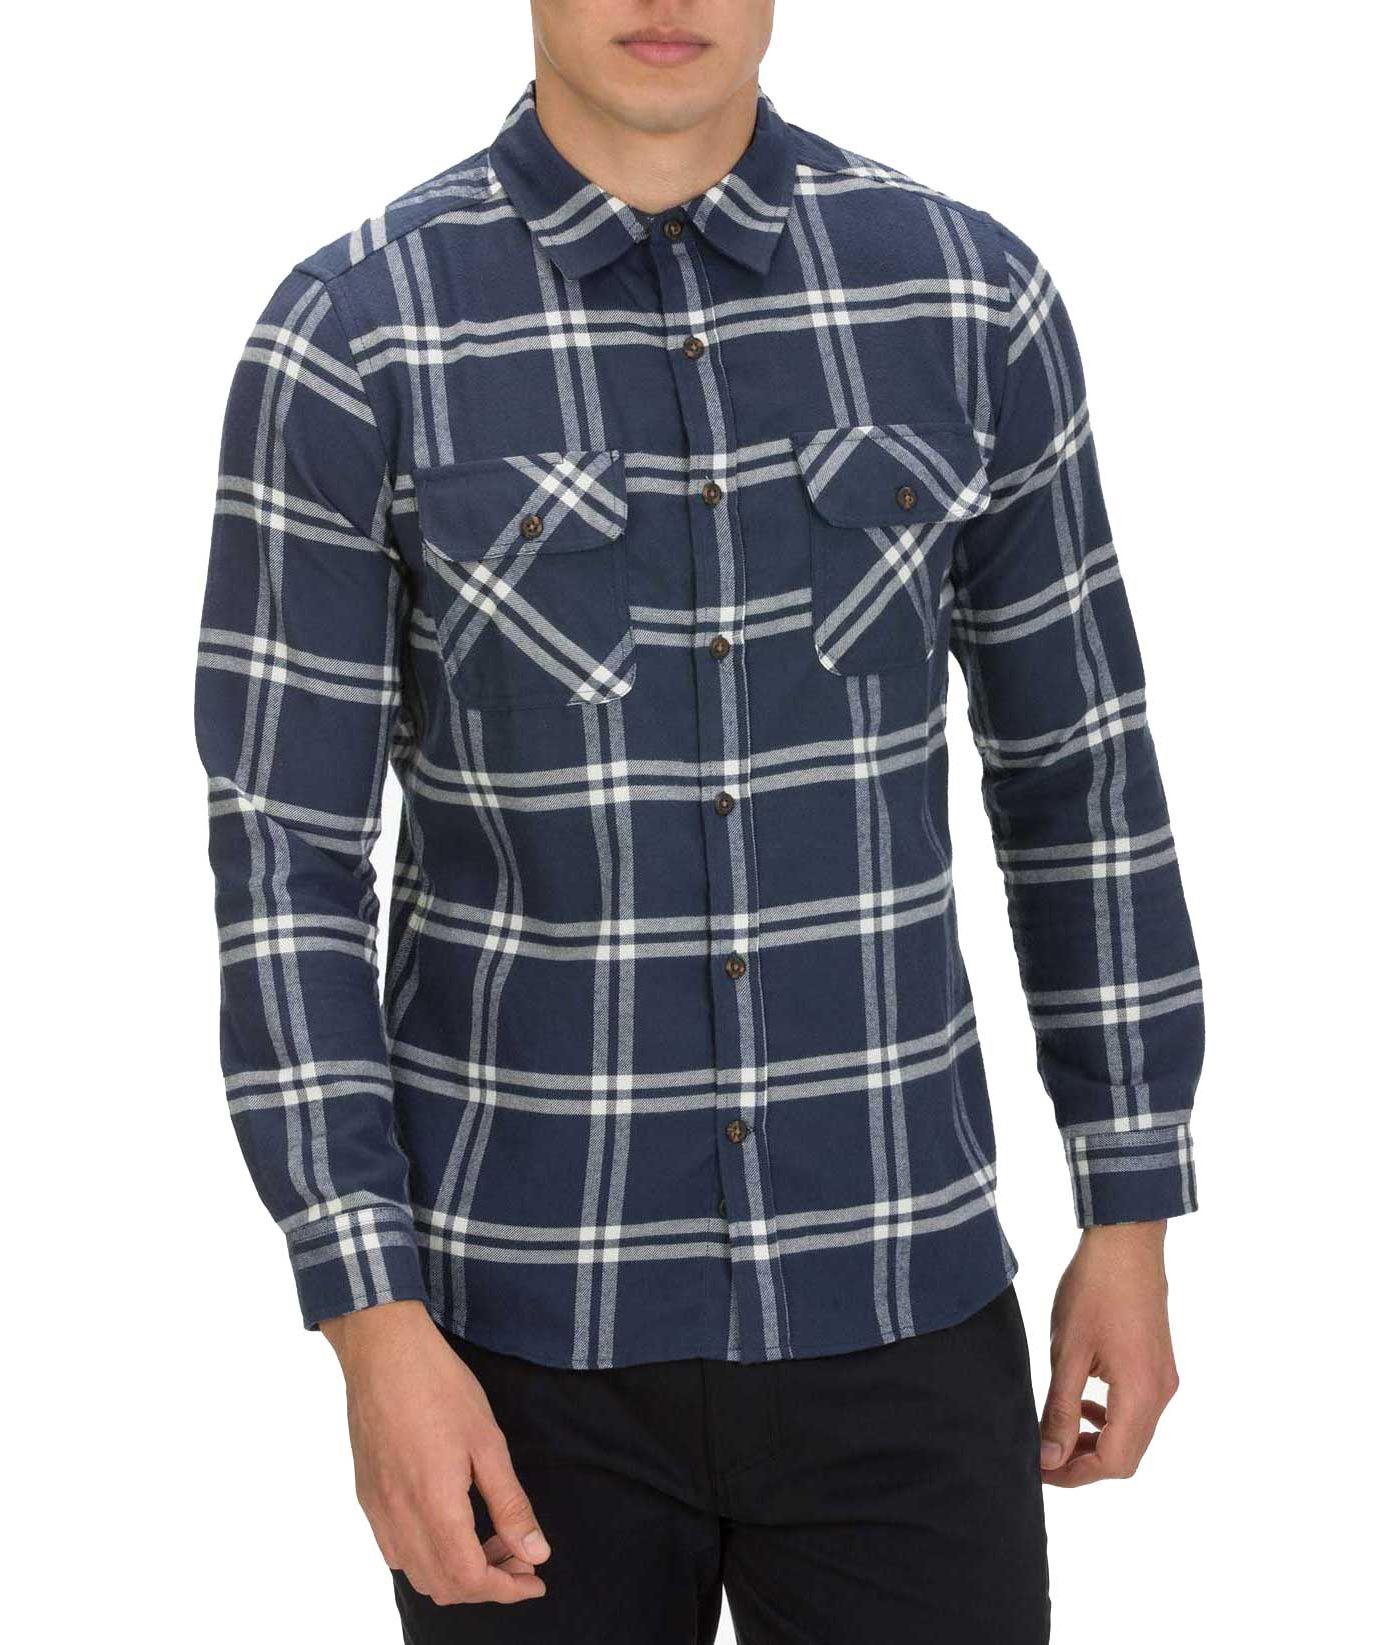 Hurley Men's Dri-FIT Slalinger Button Down Long Sleeve Shirt